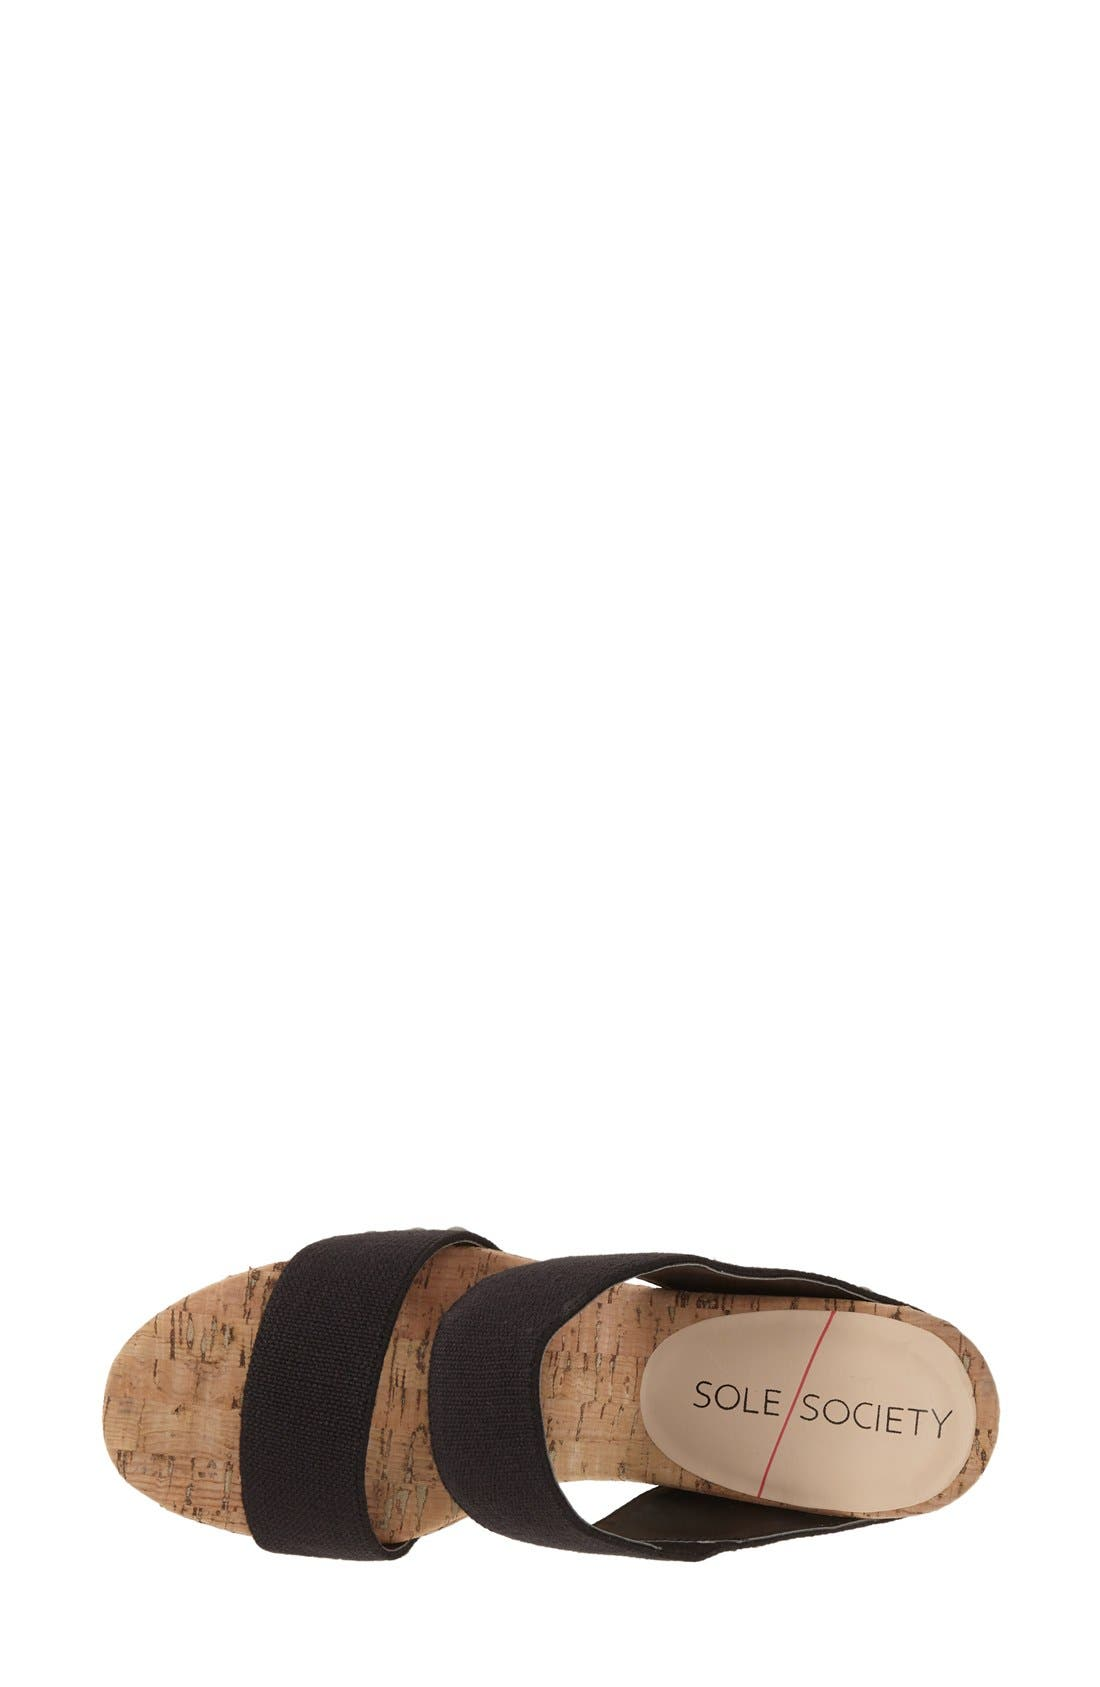 'Emilia 2' Wedge Sandal,                             Alternate thumbnail 3, color,                             Black